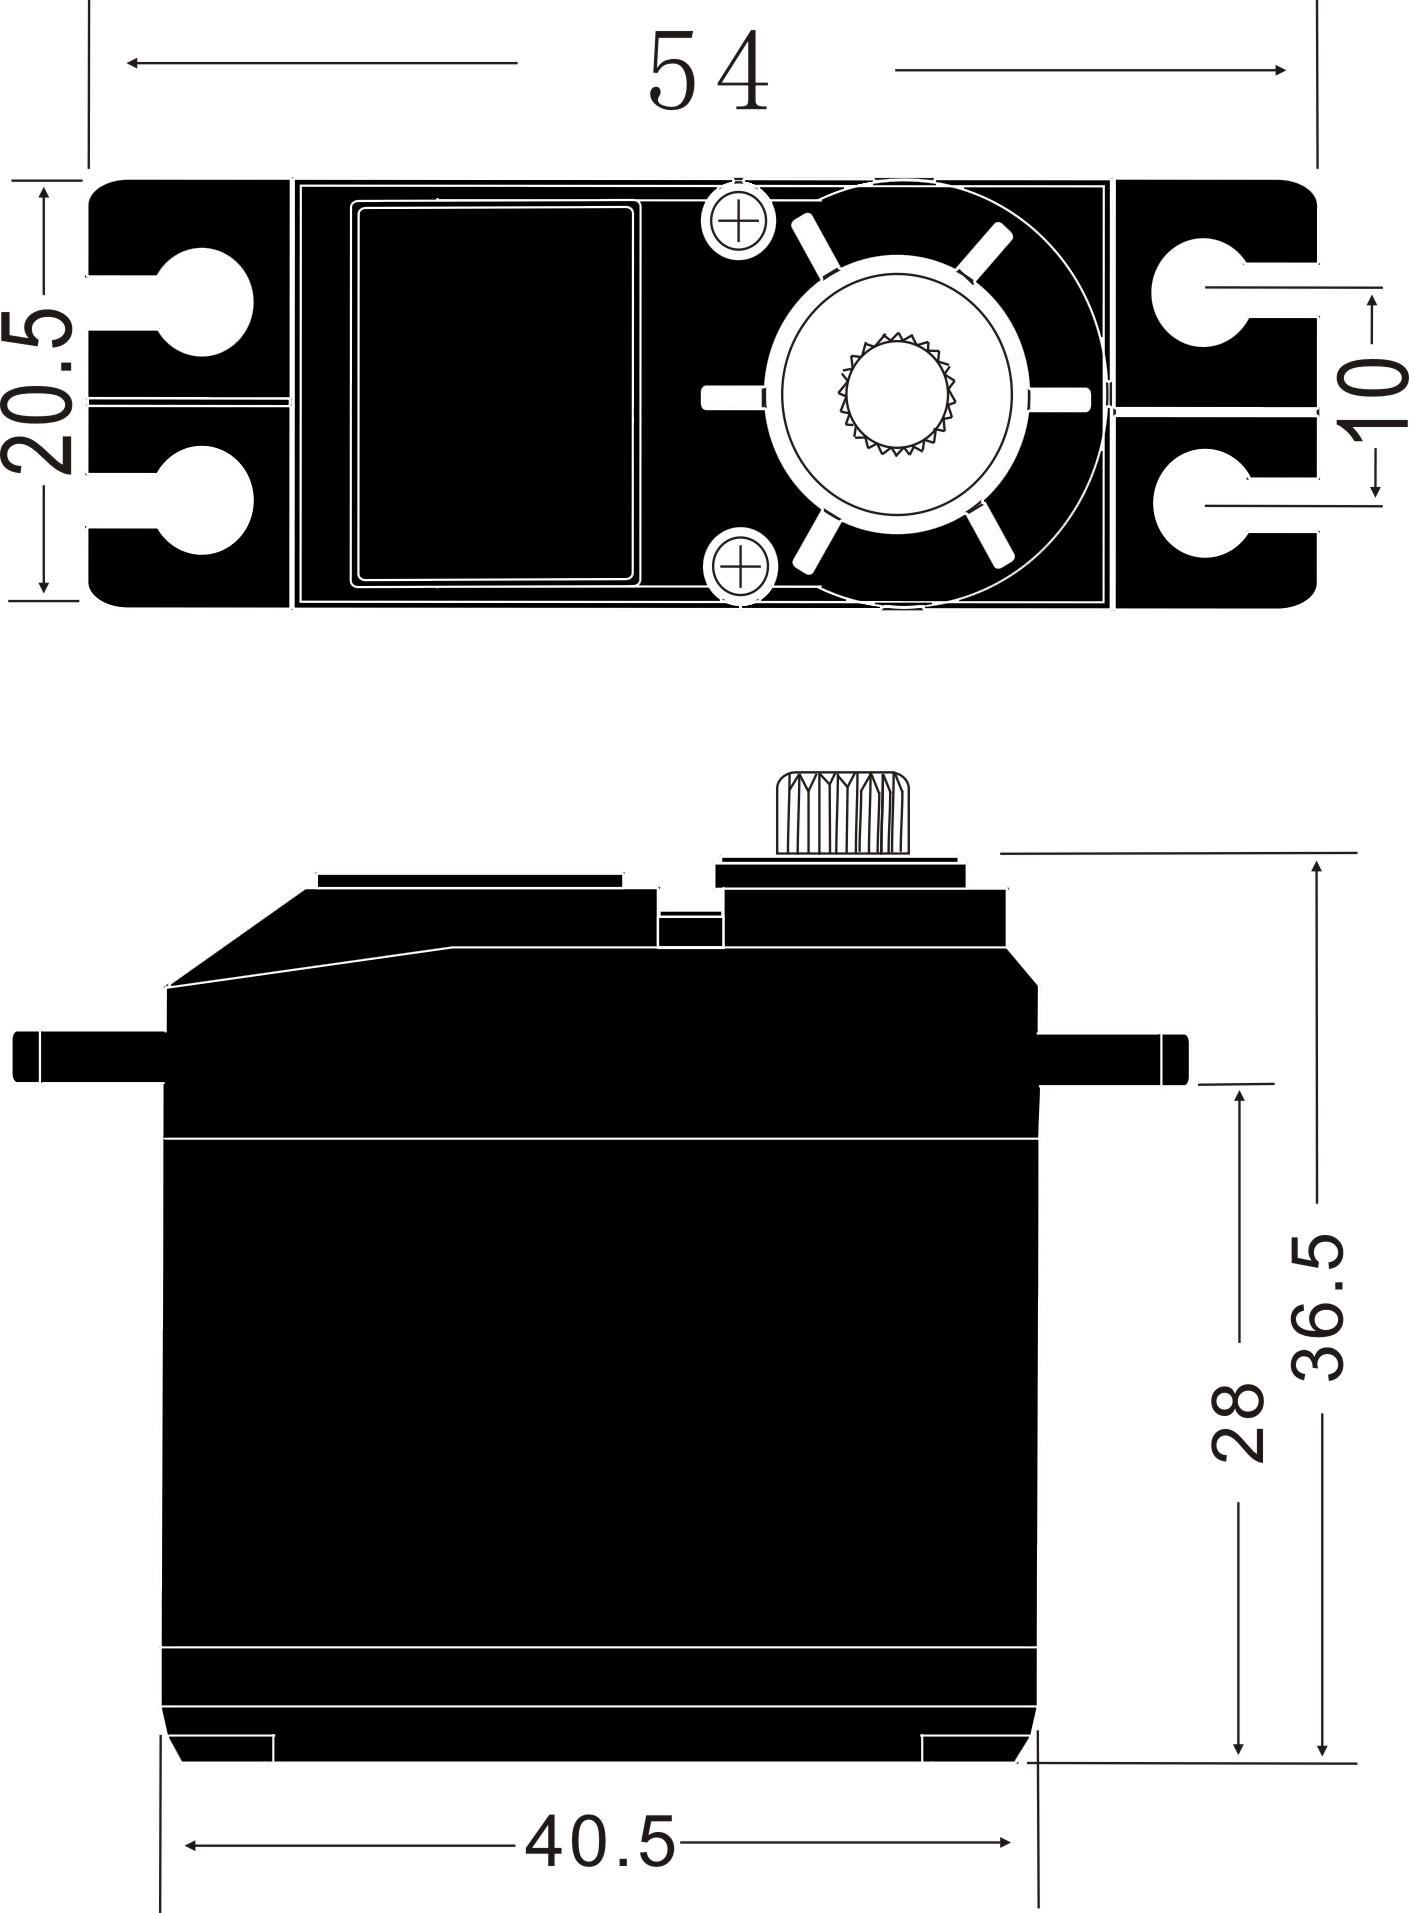 Click image for larger version  Name:HV-2363MG=HV-3260MG.jpg Views:87 Size:231.8 KB ID:2154908